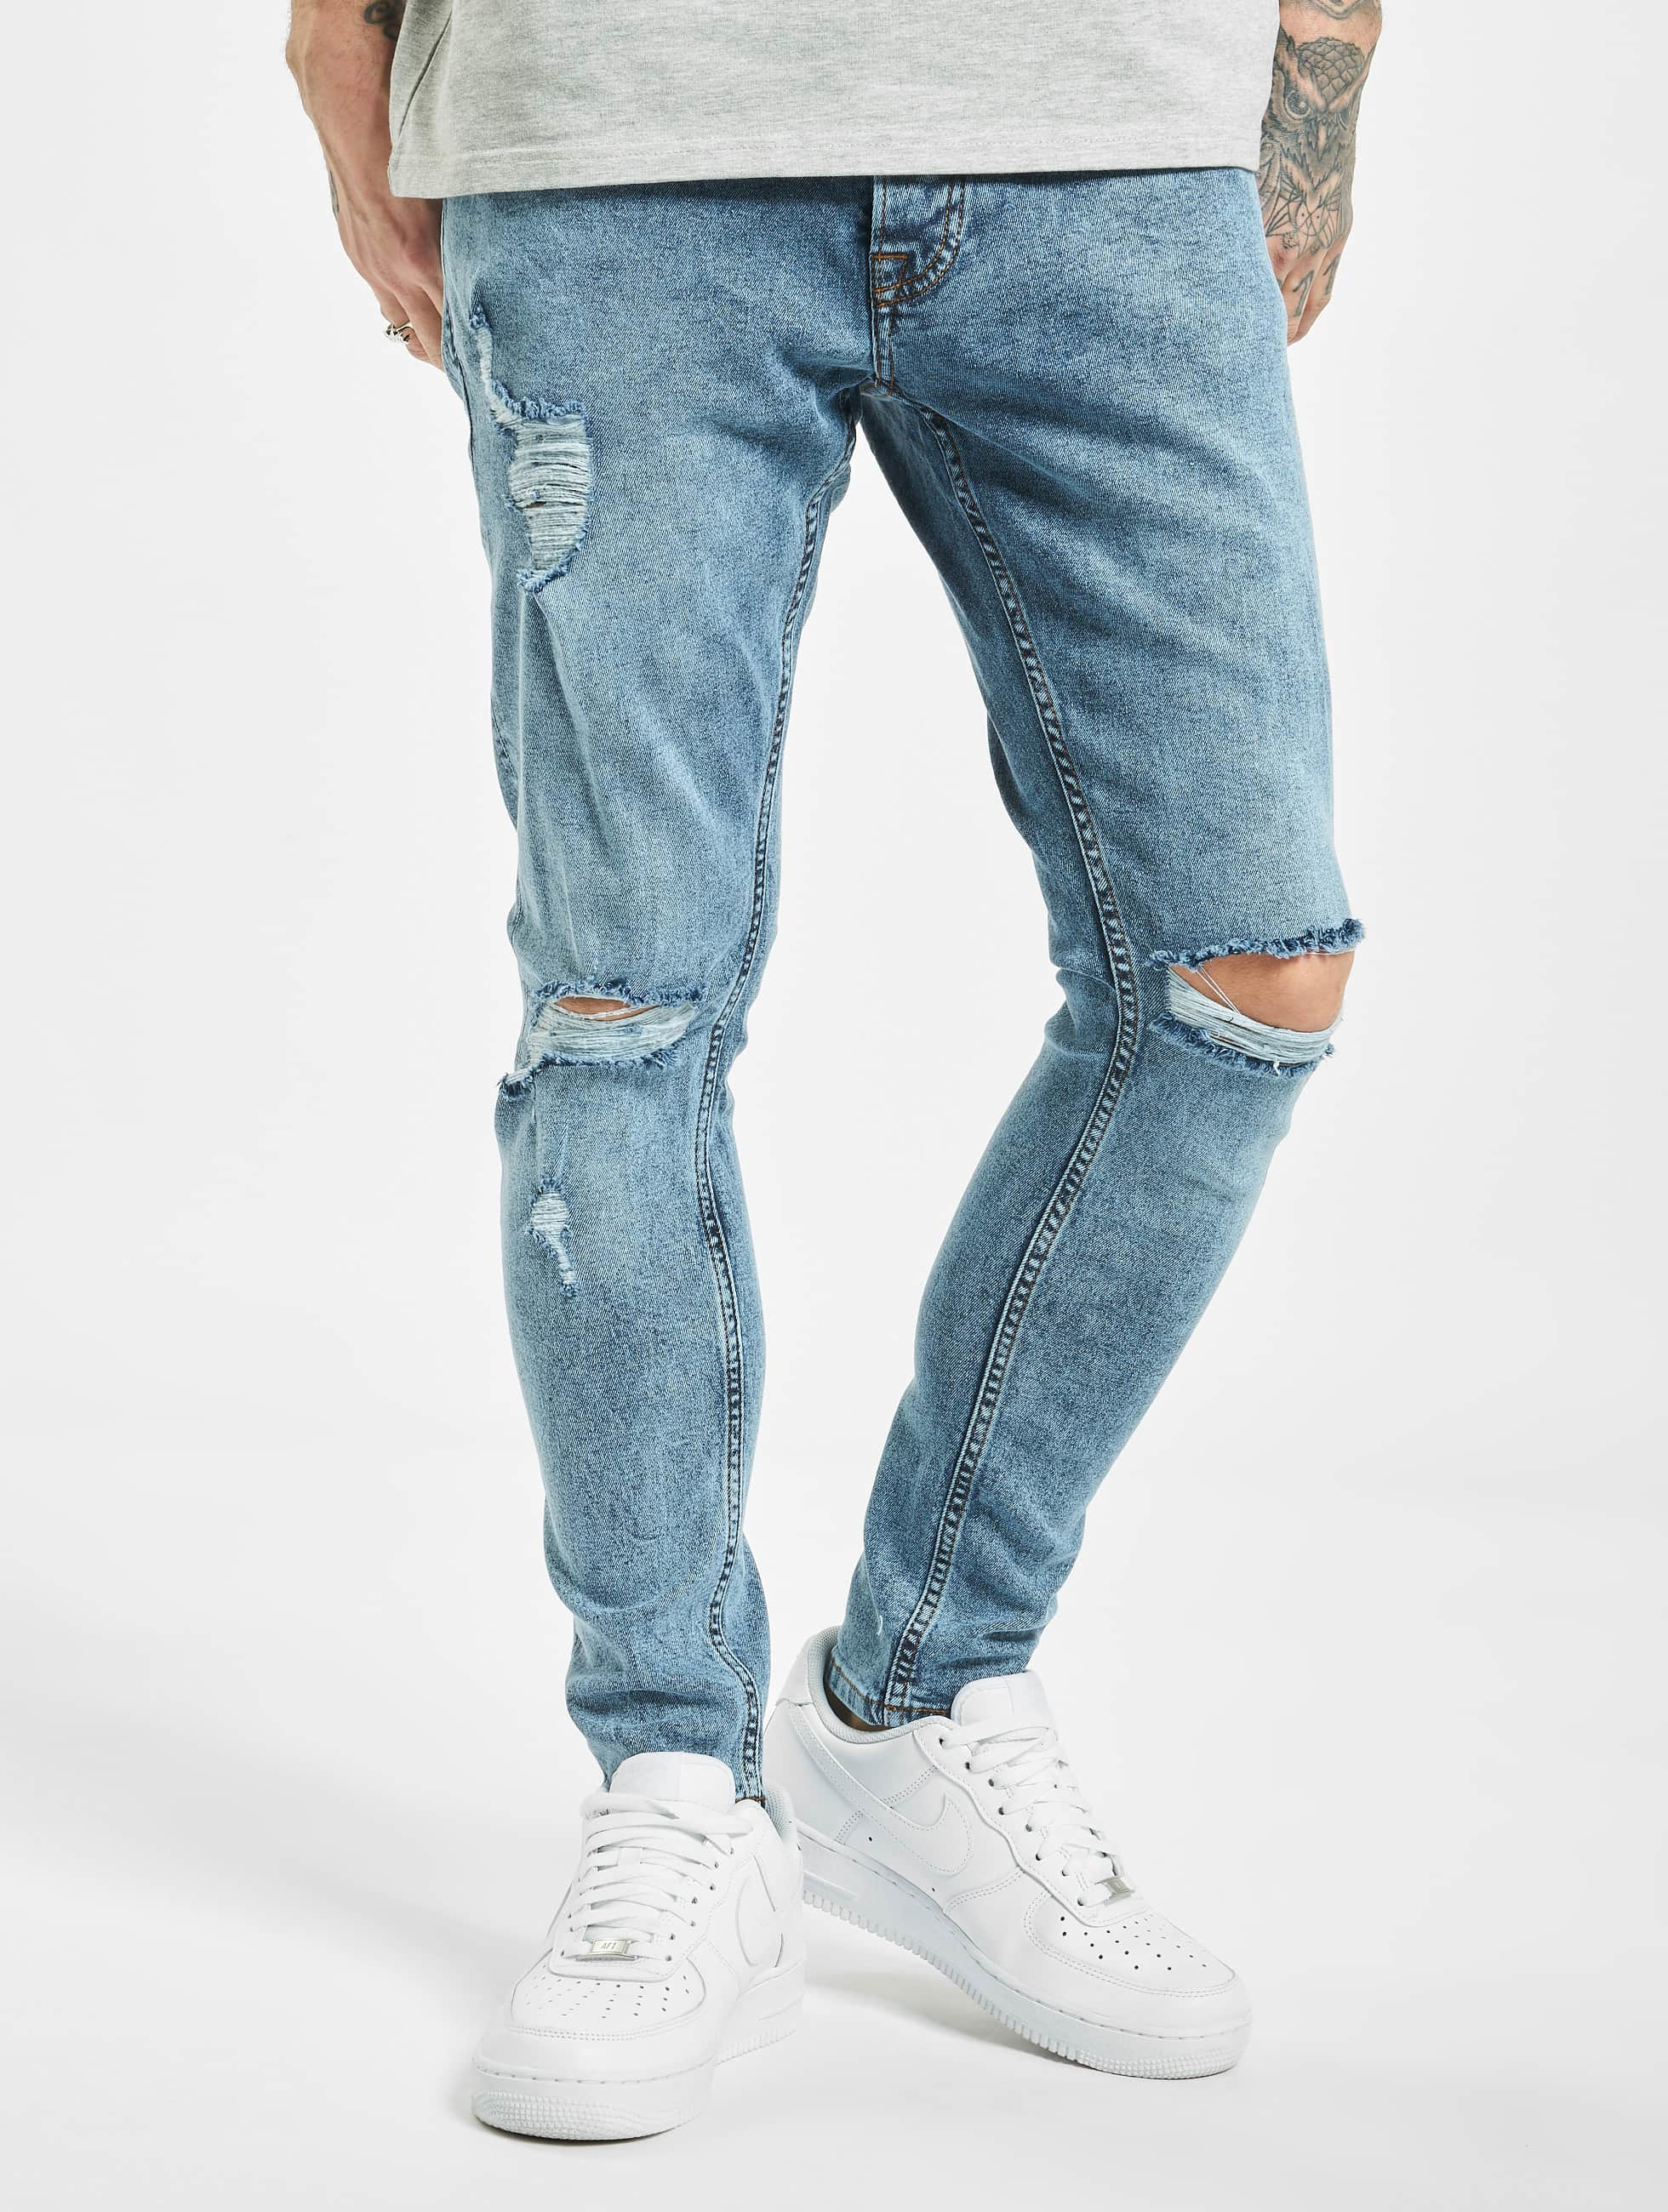 2Y / Slim Fit Jeans Alkim in blue W 29